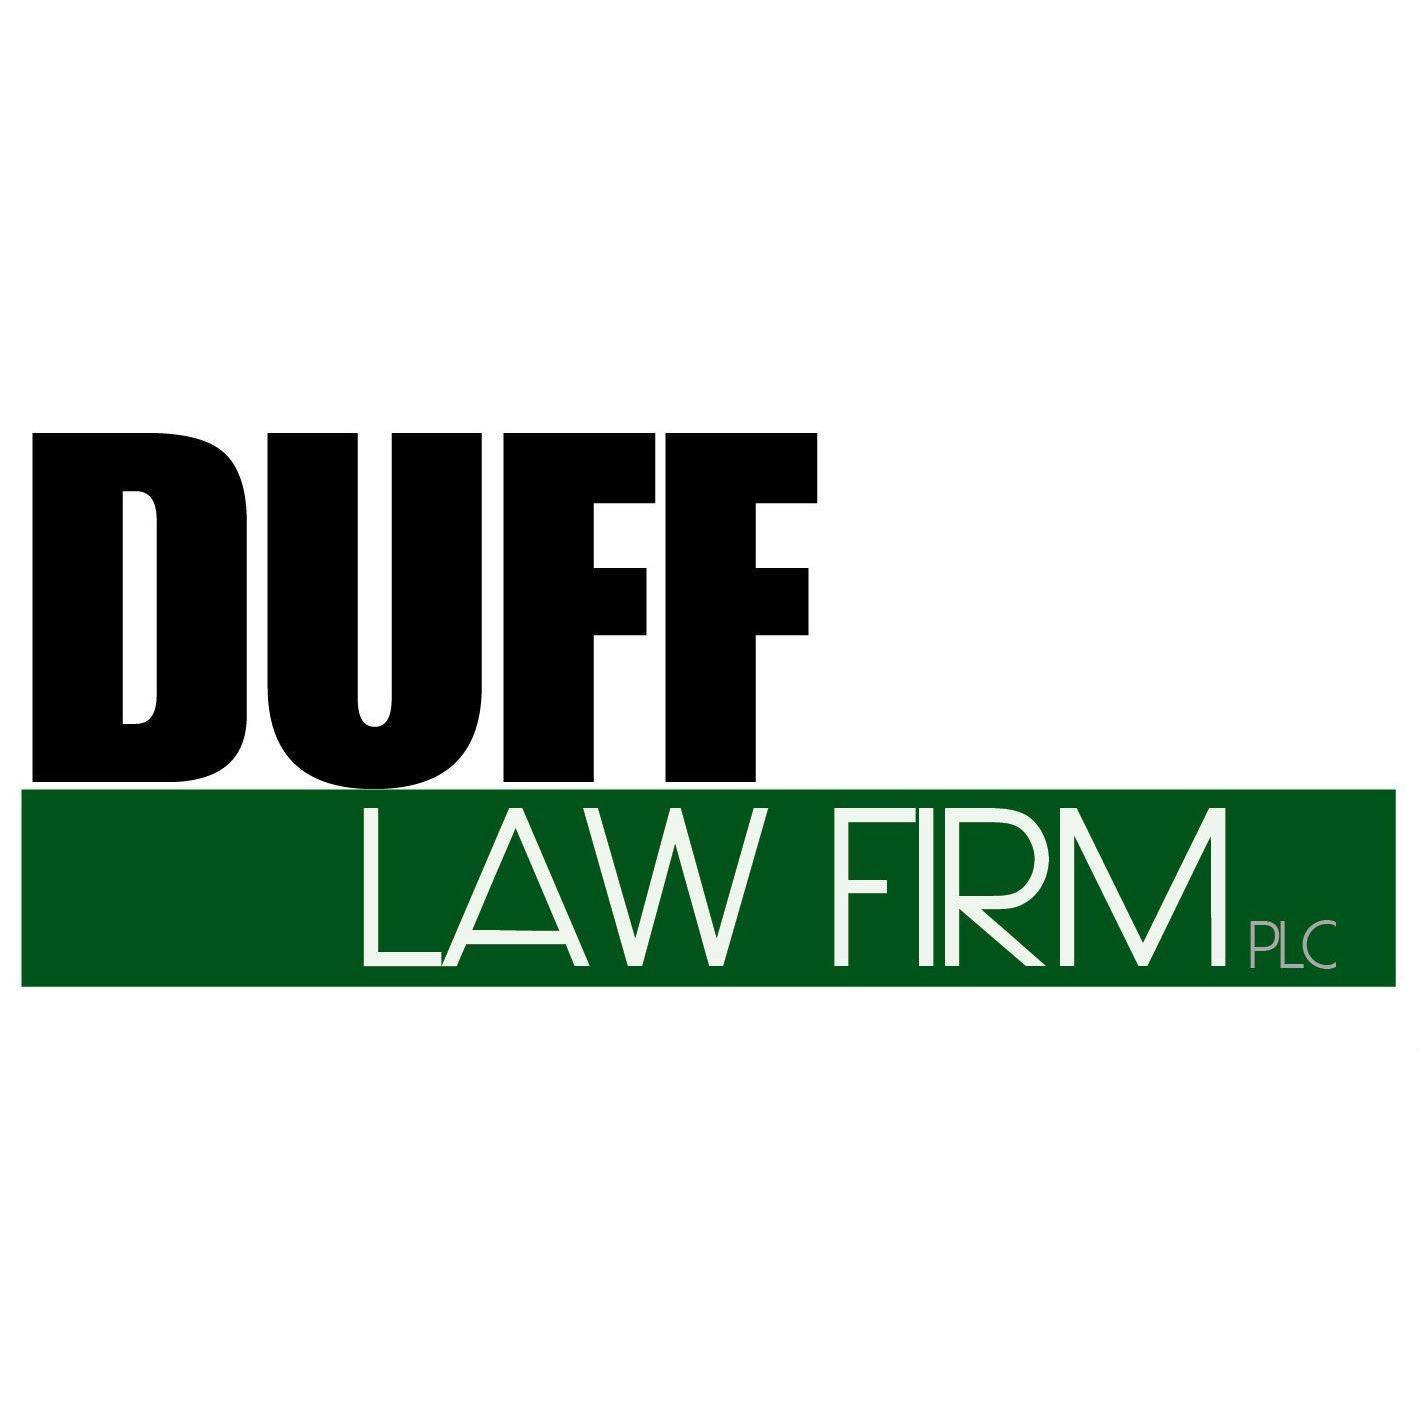 Duff Law Firm, P.L.C.